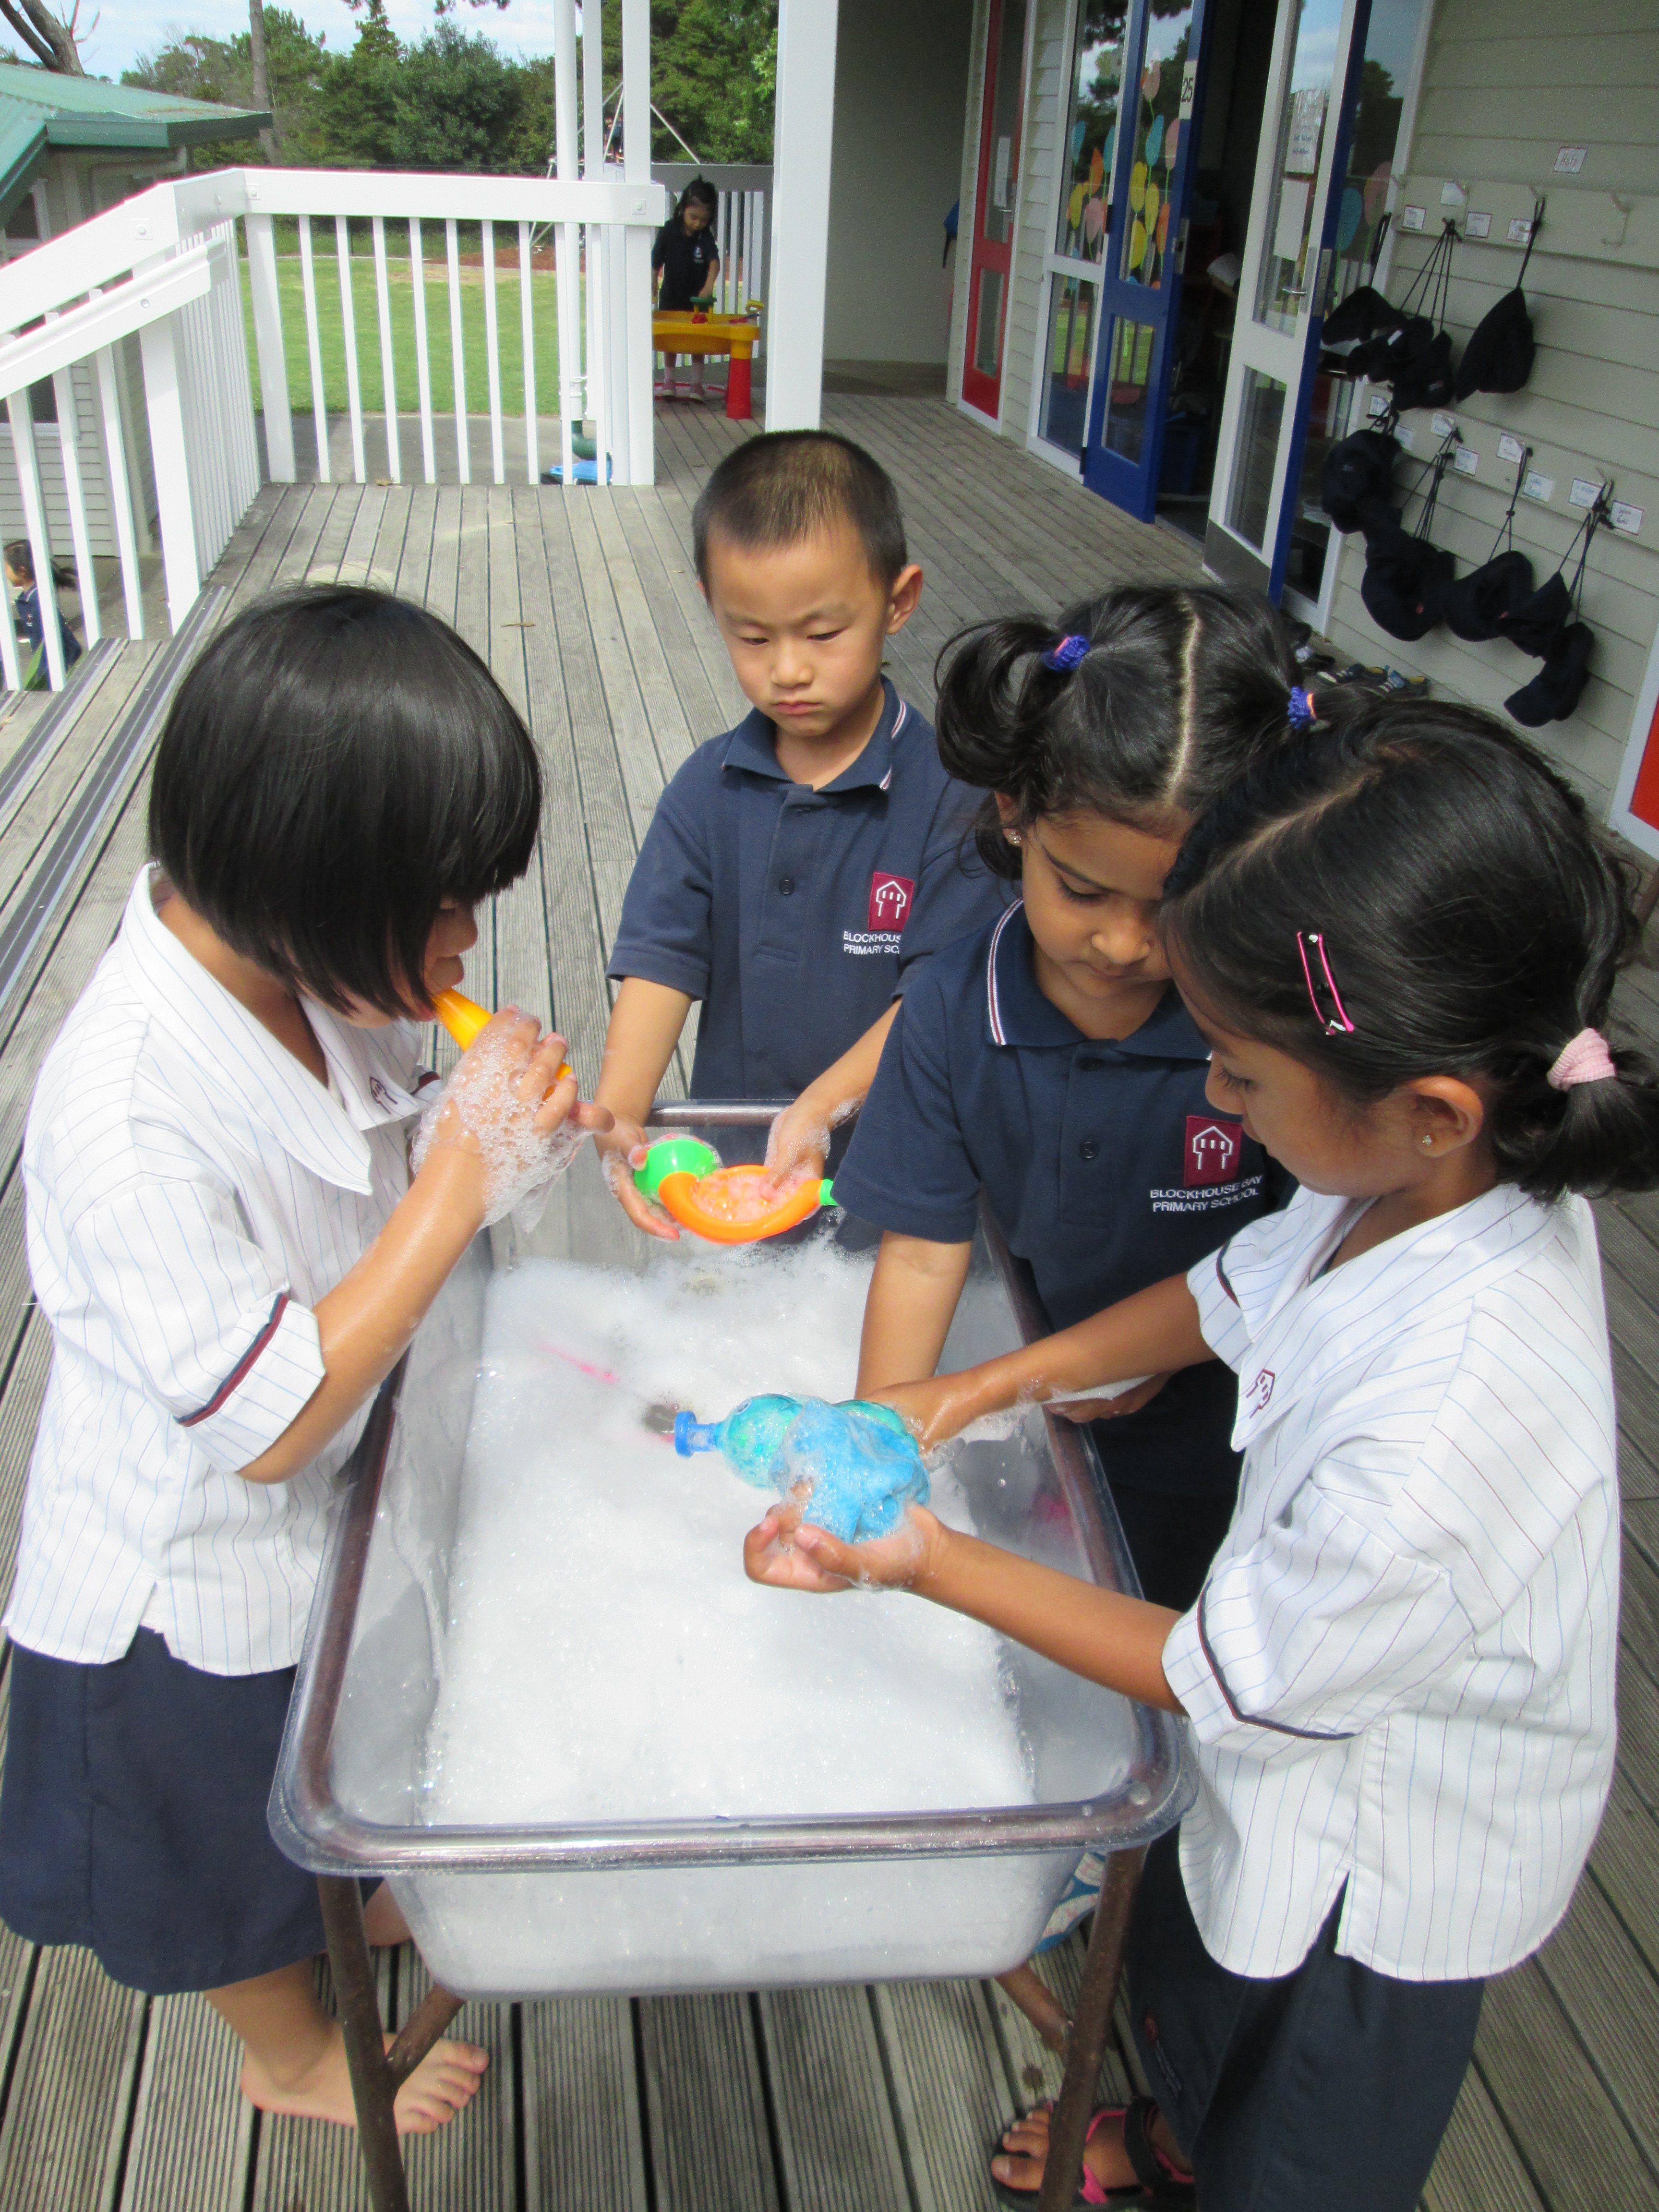 Blockhouse Bay Primary School - Bubbles everywhere